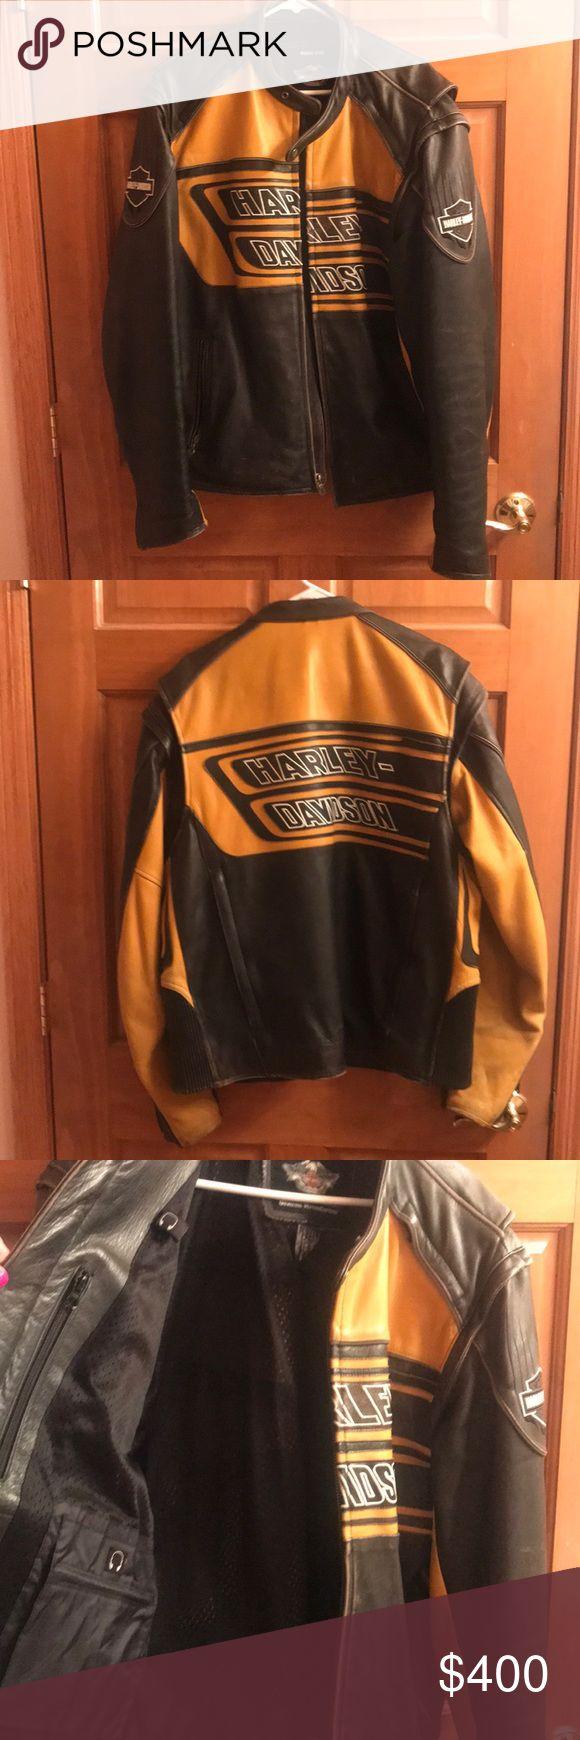 Men's Harley Davidson leather jacket Yellow and black leather men's Harley Davidson jacket Harley-Davidson Jackets & Coats